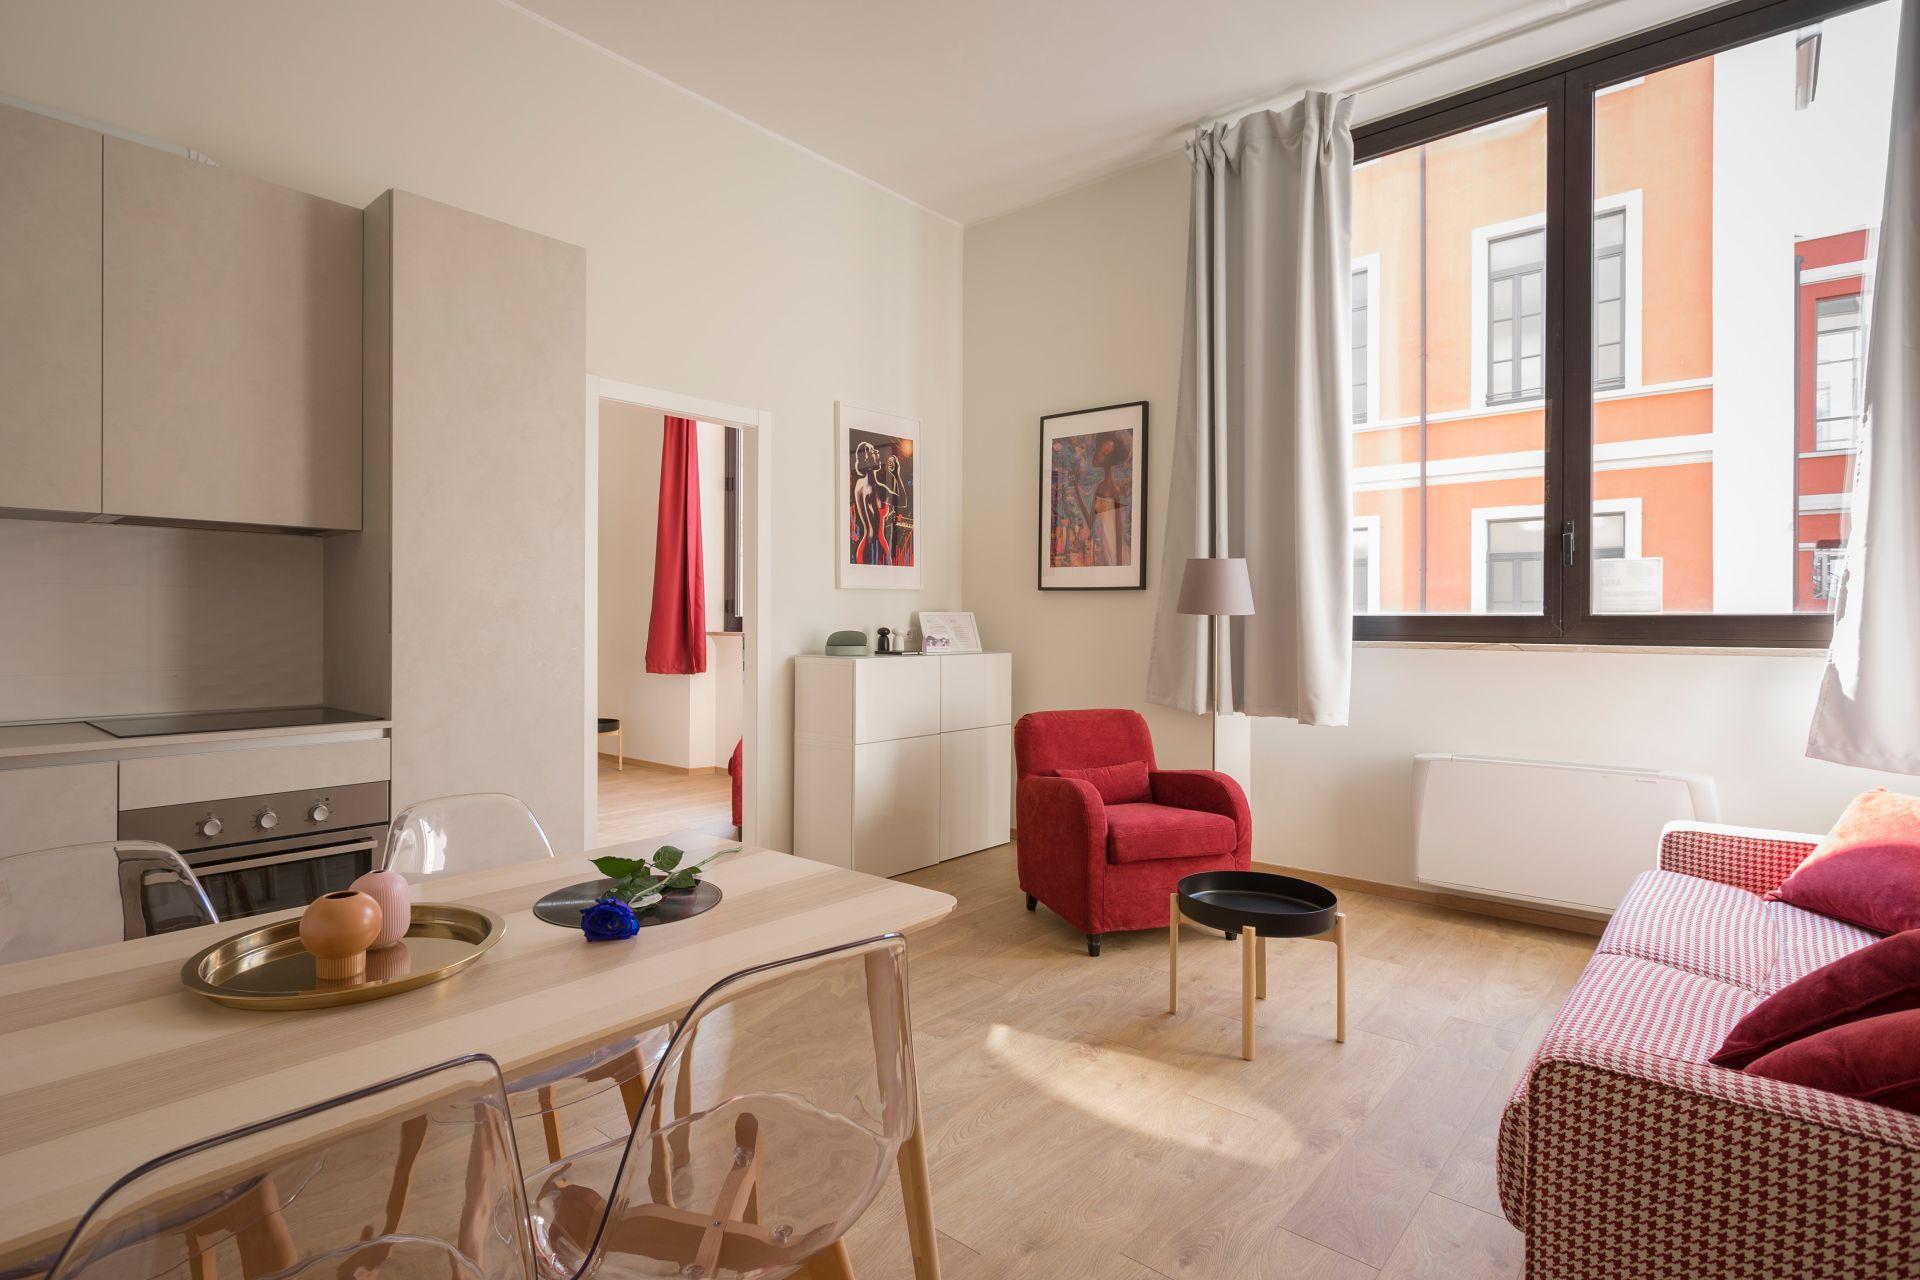 3 Tips for New Landlords